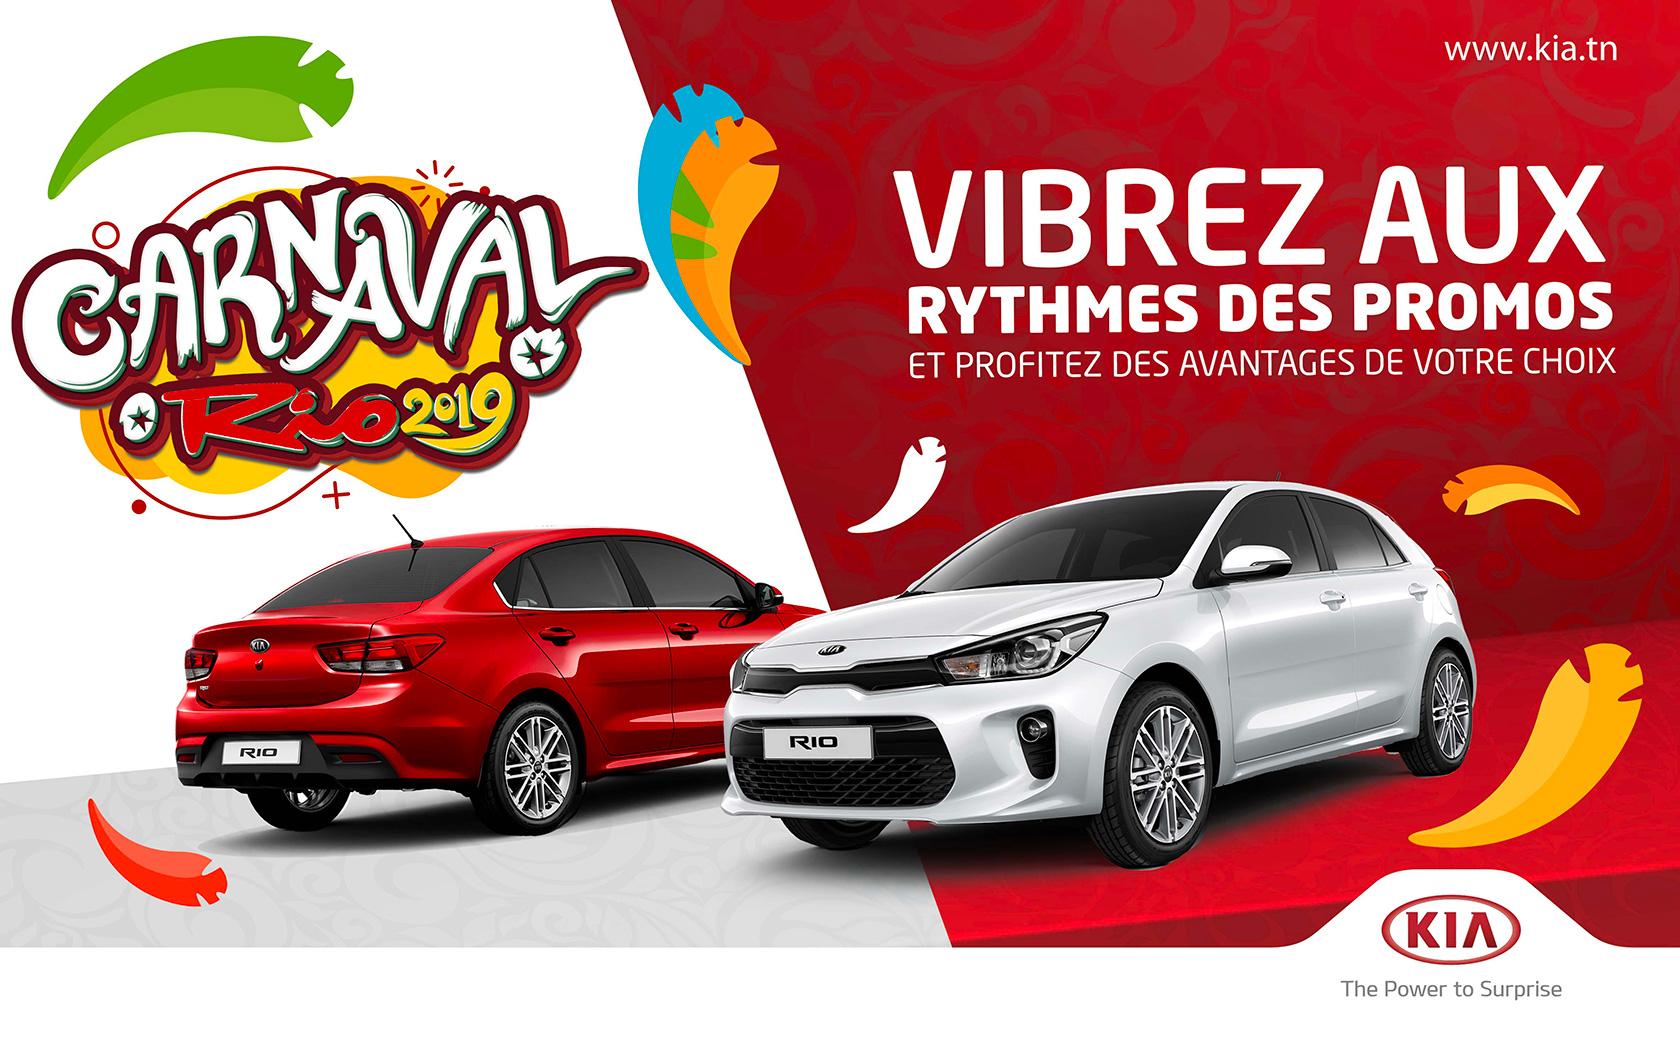 Kia lance le Carnaval Rio 2019